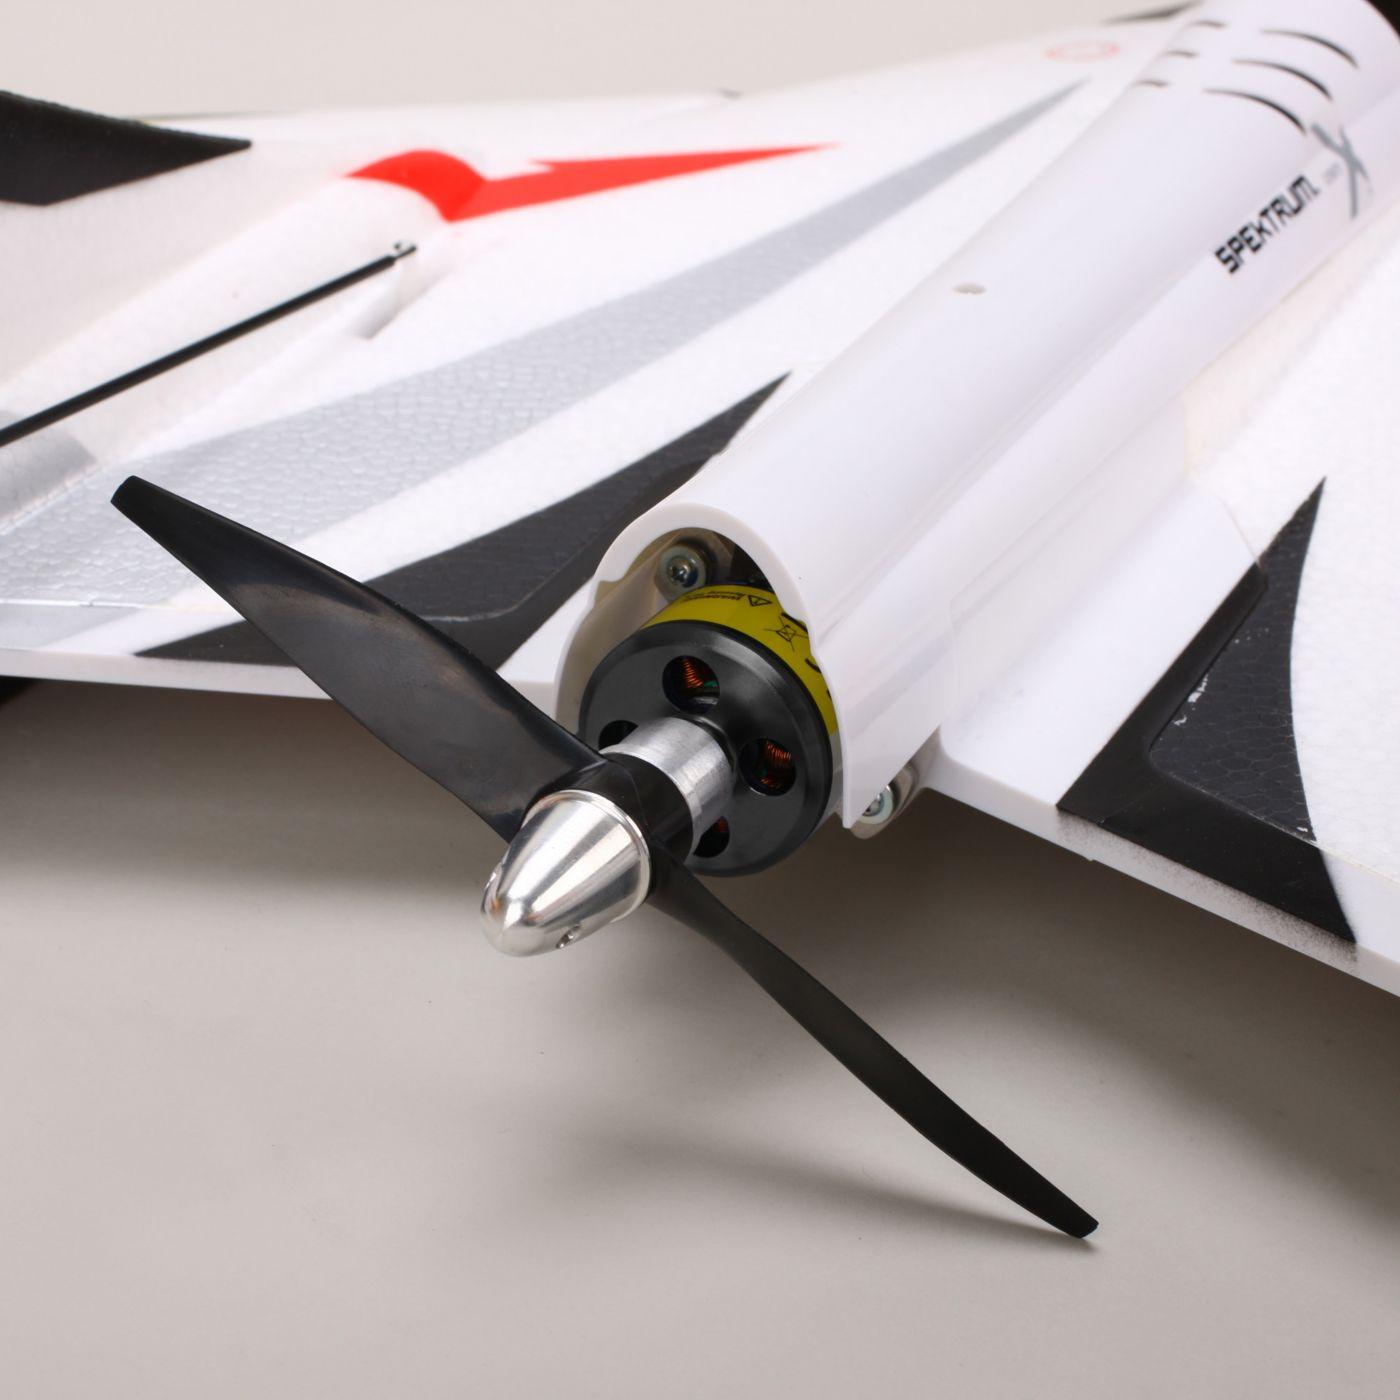 F-27Q Stryker parkzone